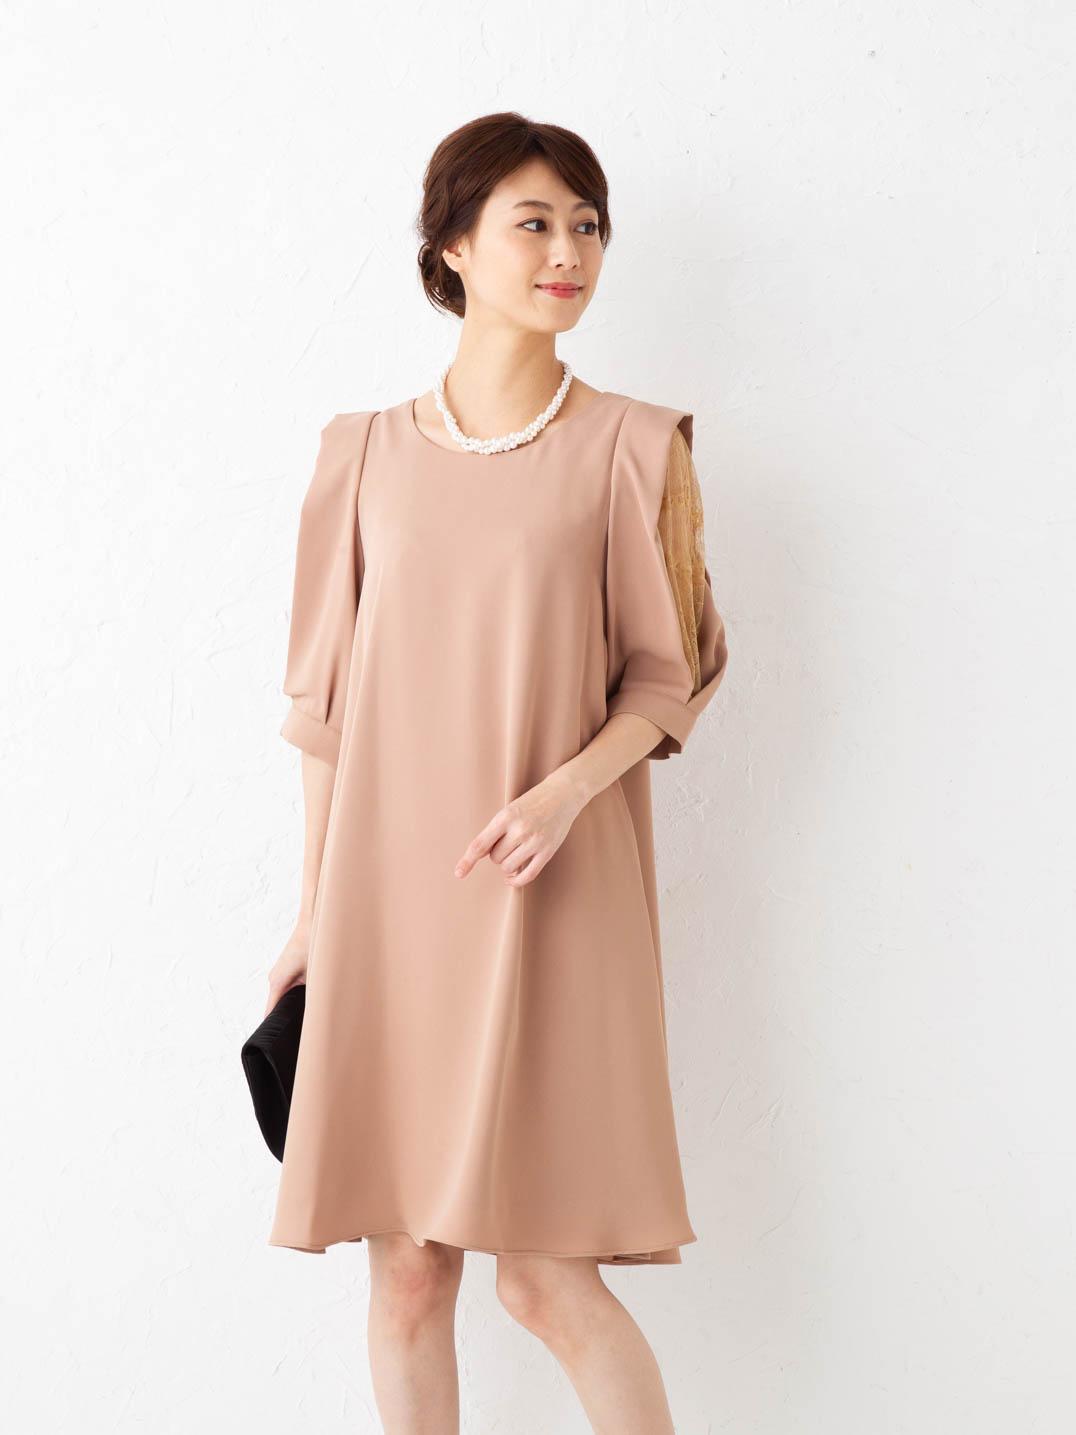 RYK ドレス / Mサイズ (DOC0096)